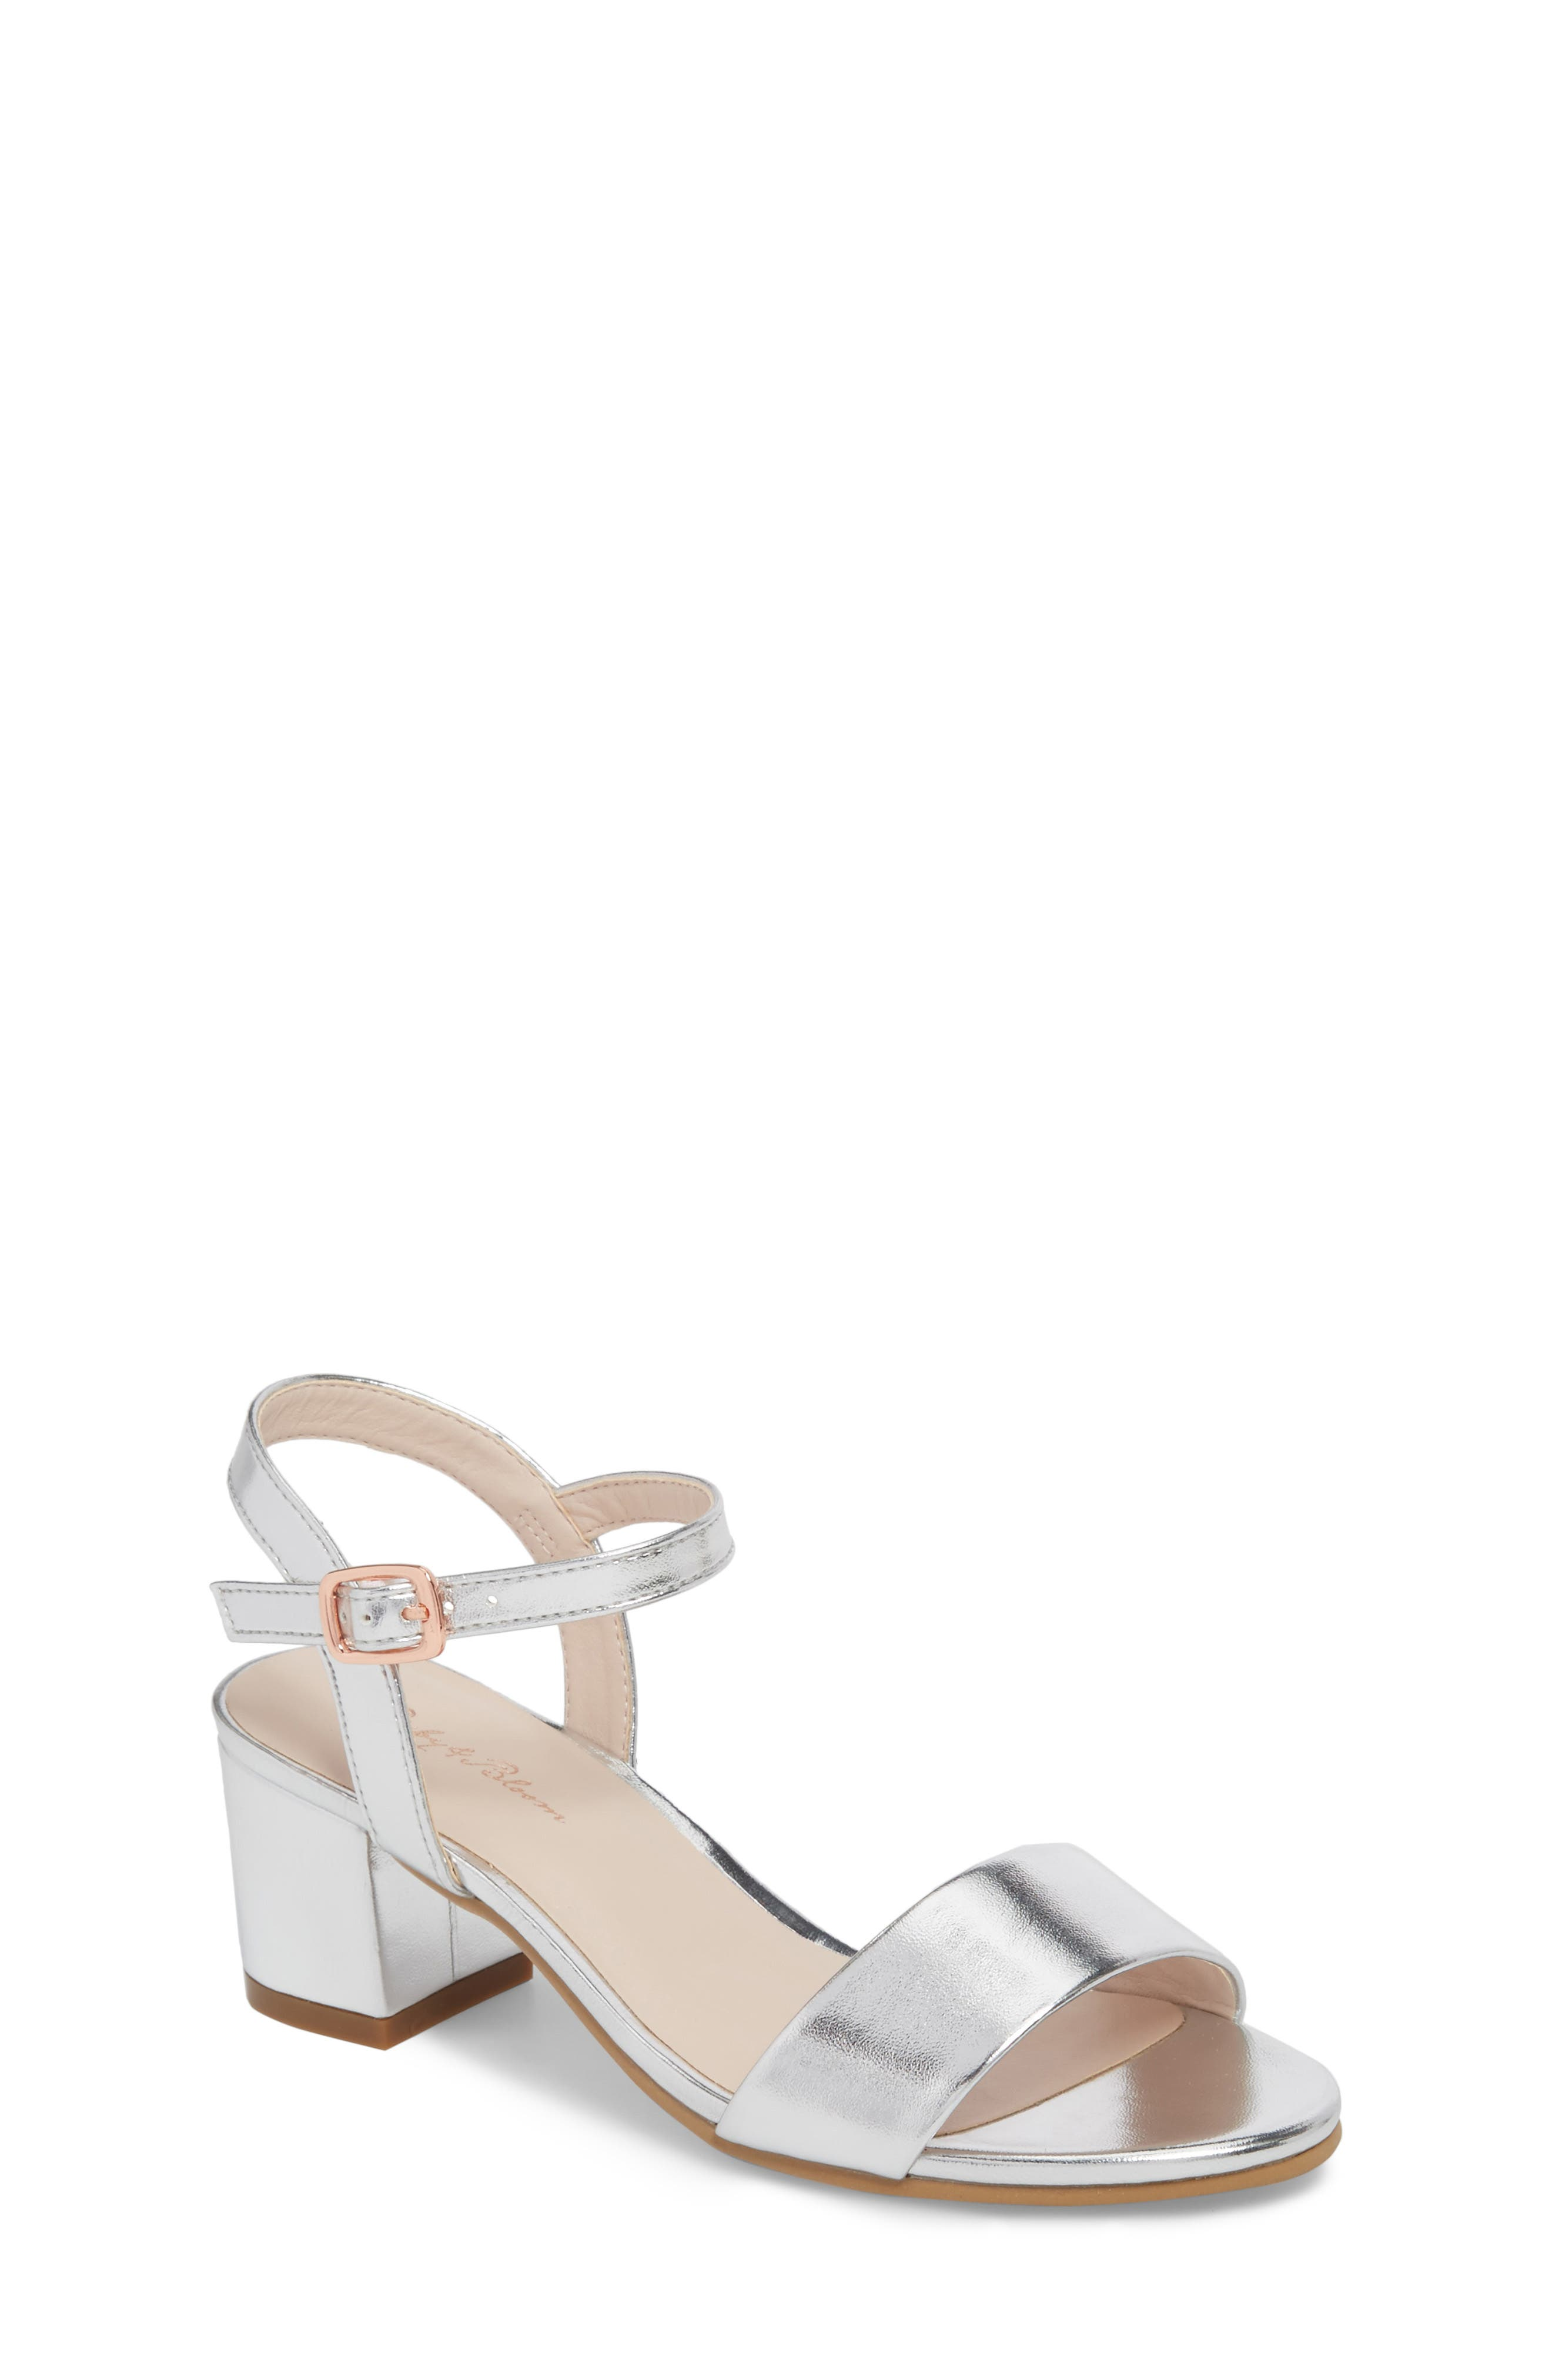 Danni Block Heel Sandal,                         Main,                         color, Silver Faux Leather